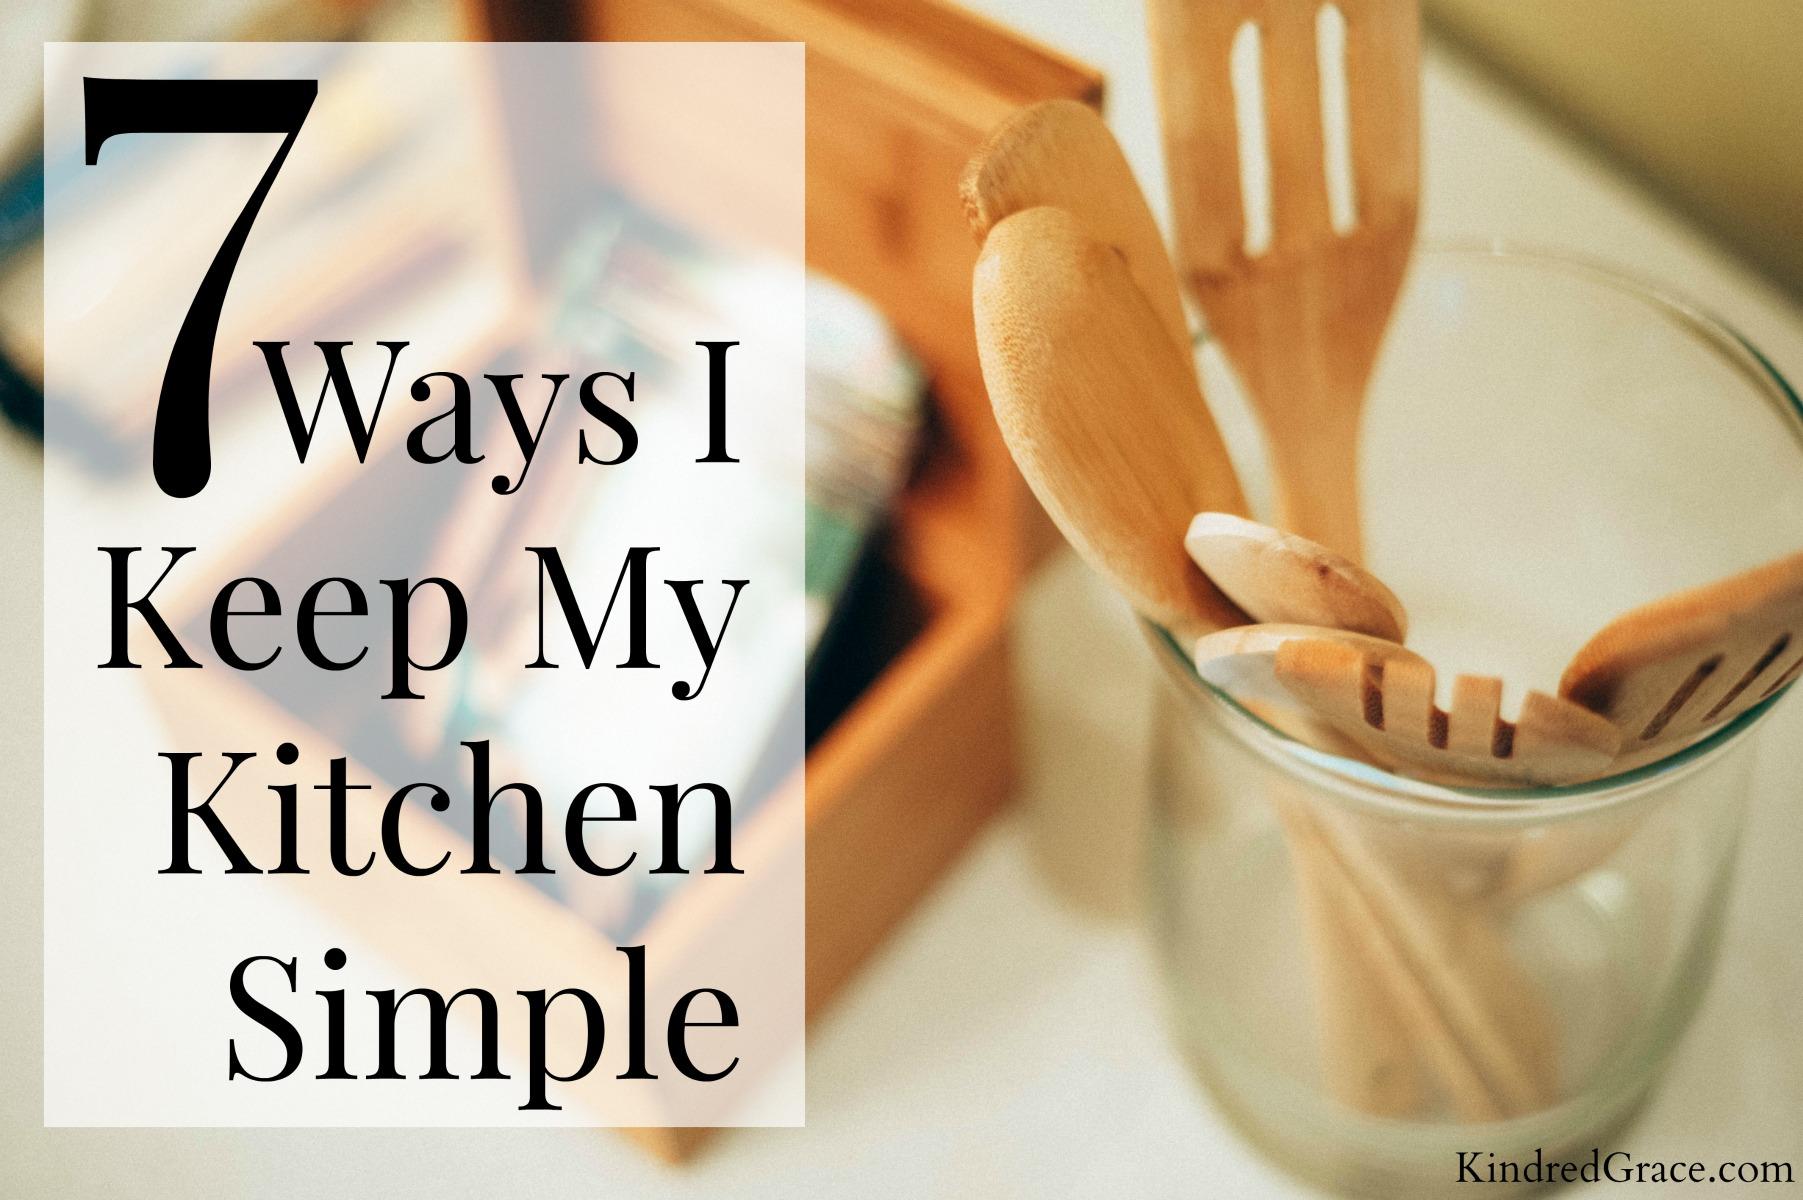 Seven Ways I Keep My Kitchen Simple